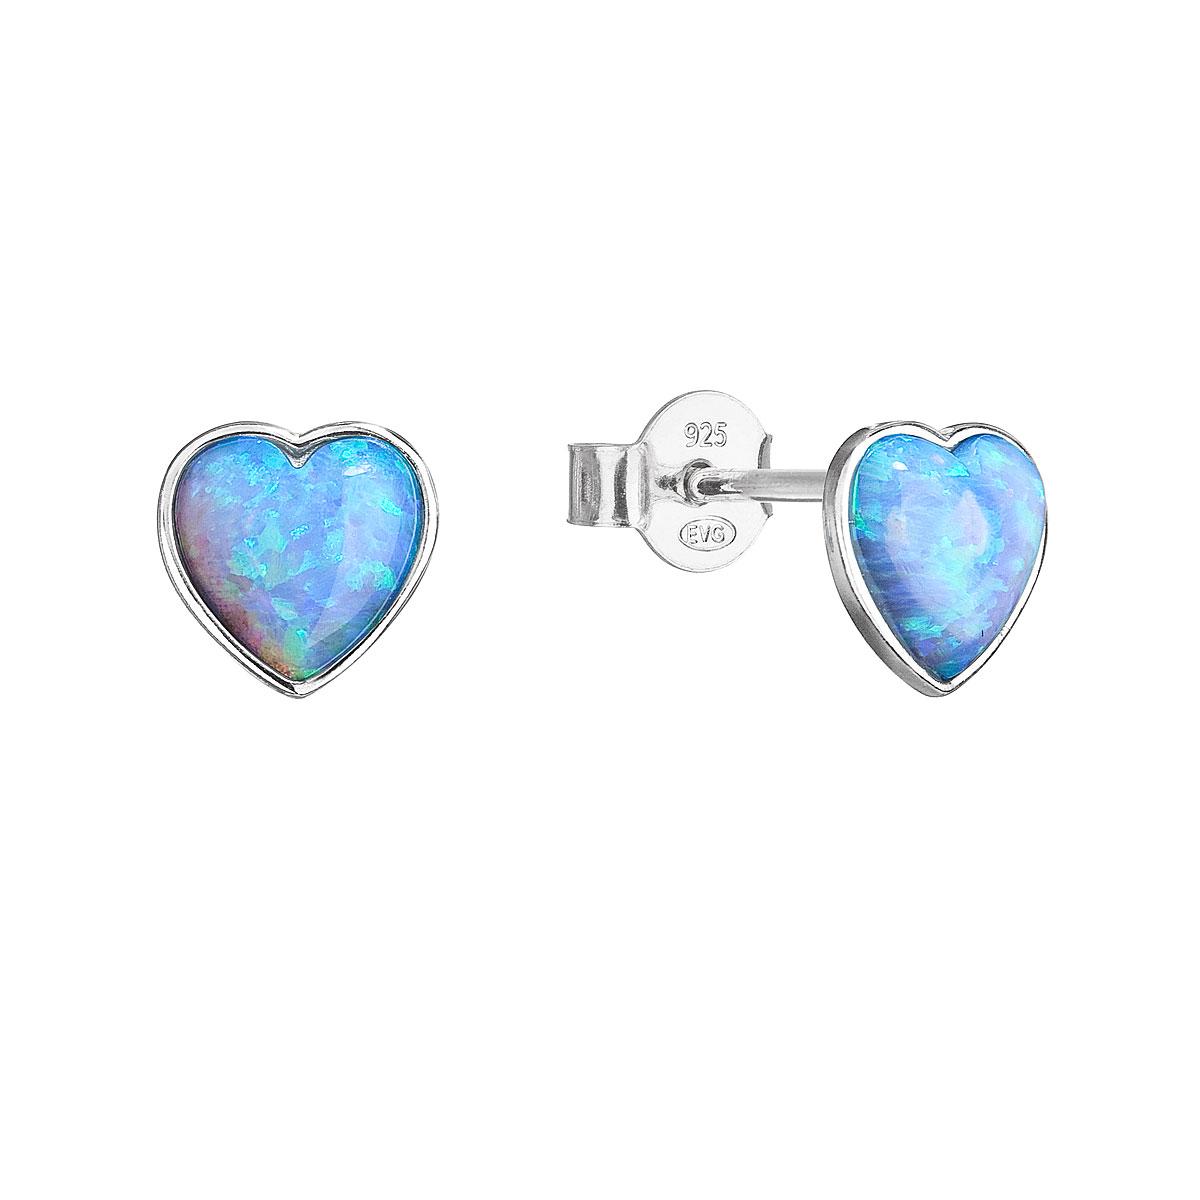 Strieborné náušnice perličky so syntetickým opálom svetlo modré srdce 11337.3